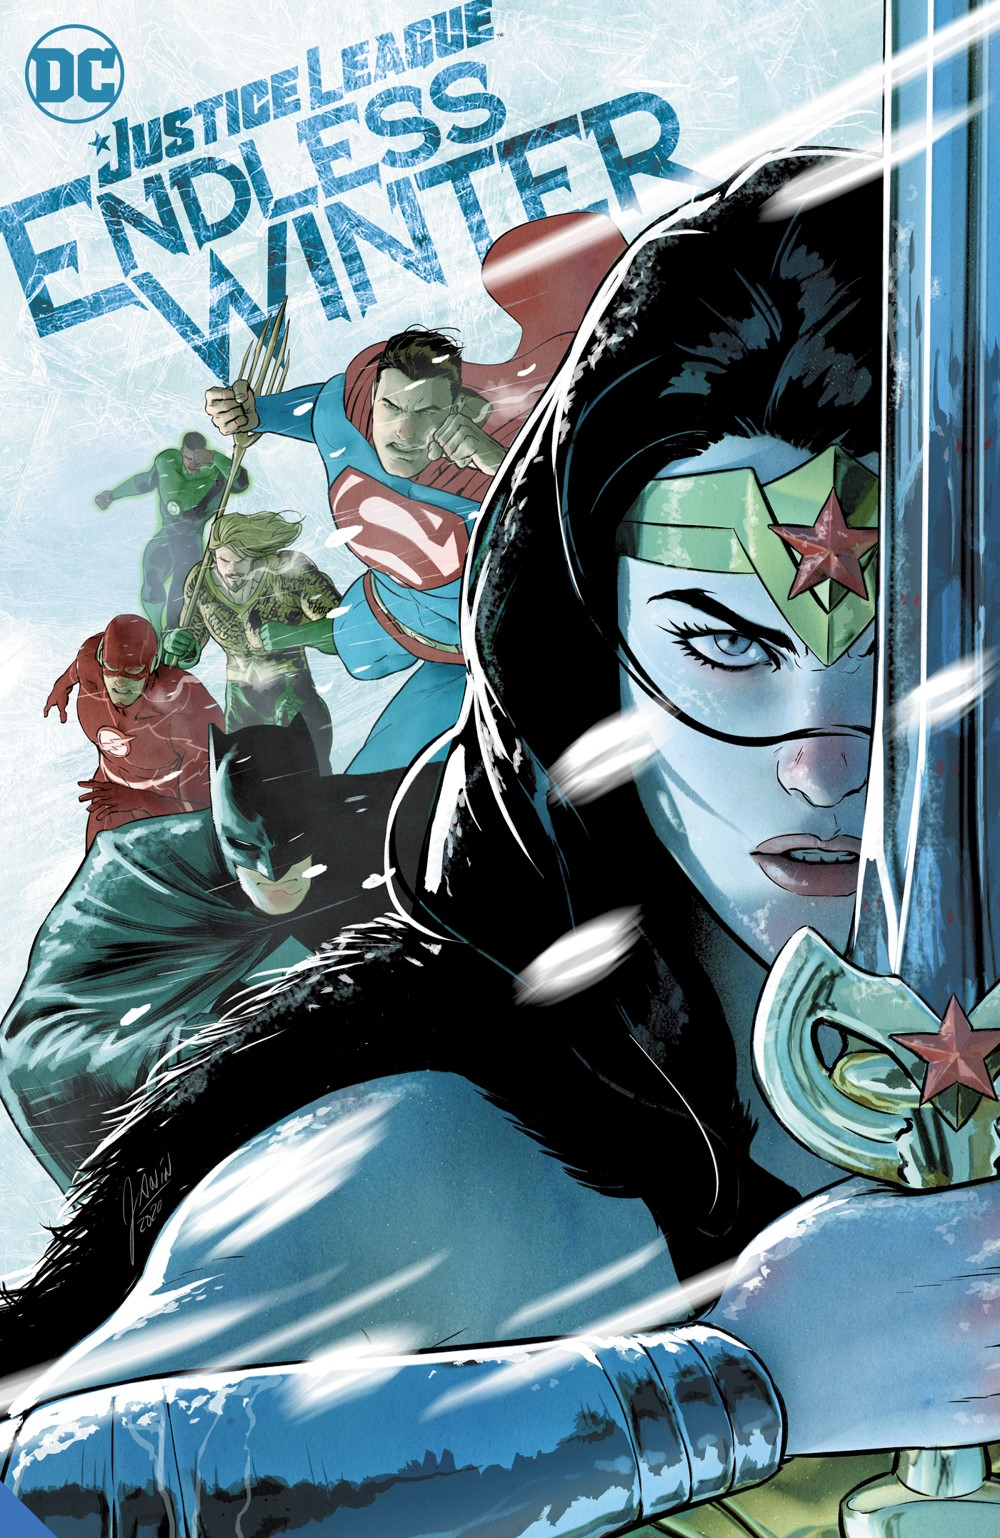 justiceleagueendlessswinter_adv DC Comics October 2021 Solicitations